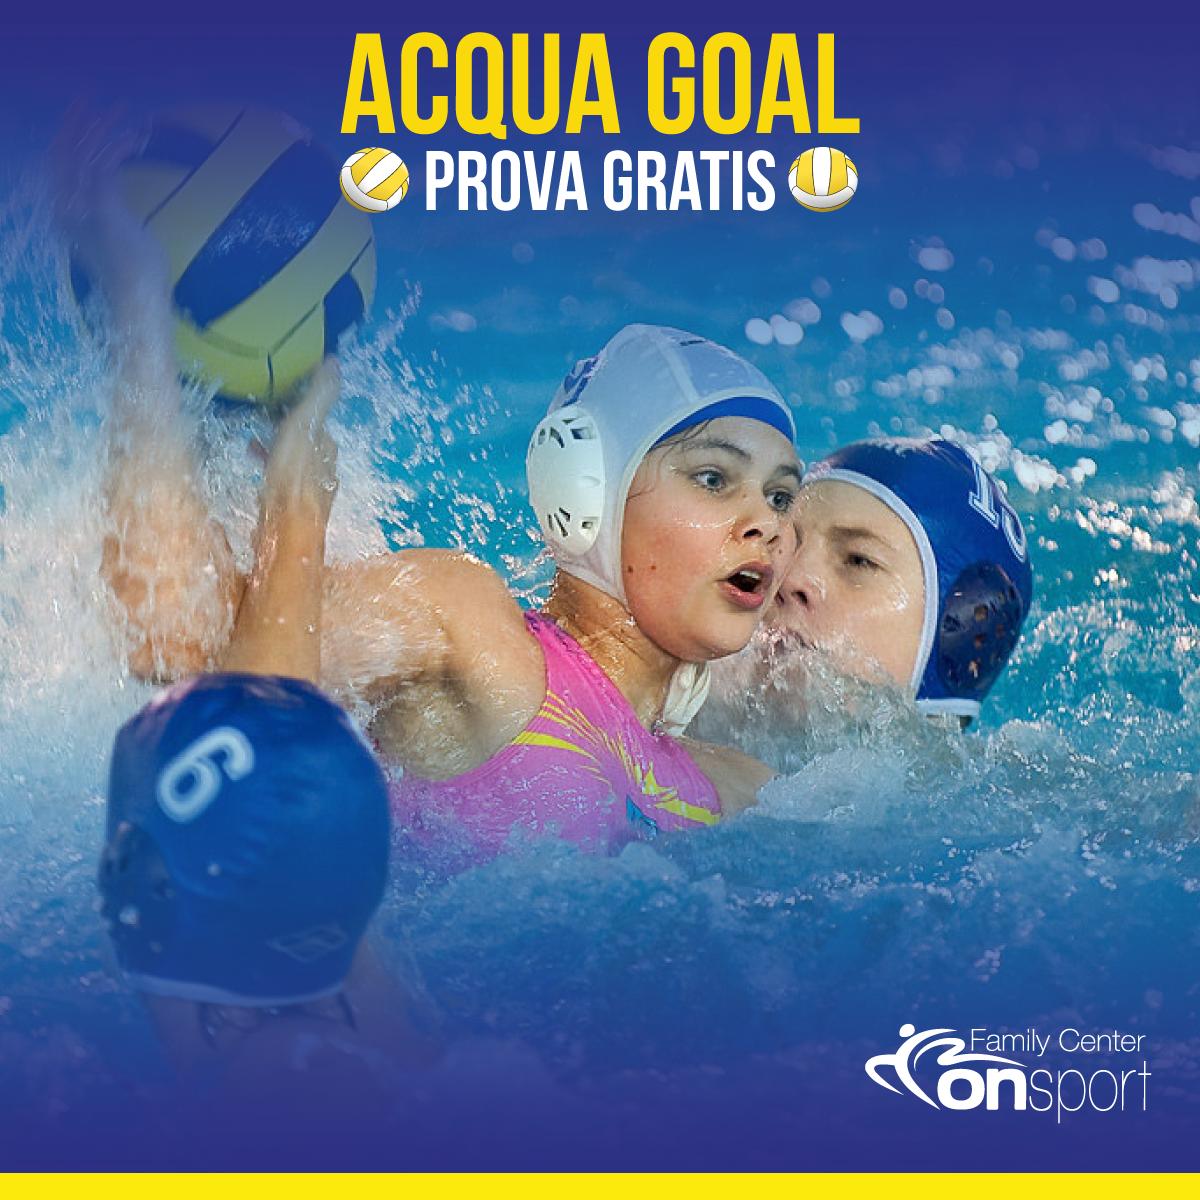 Prova Gratis Acqua Goal [Sestri Levante]